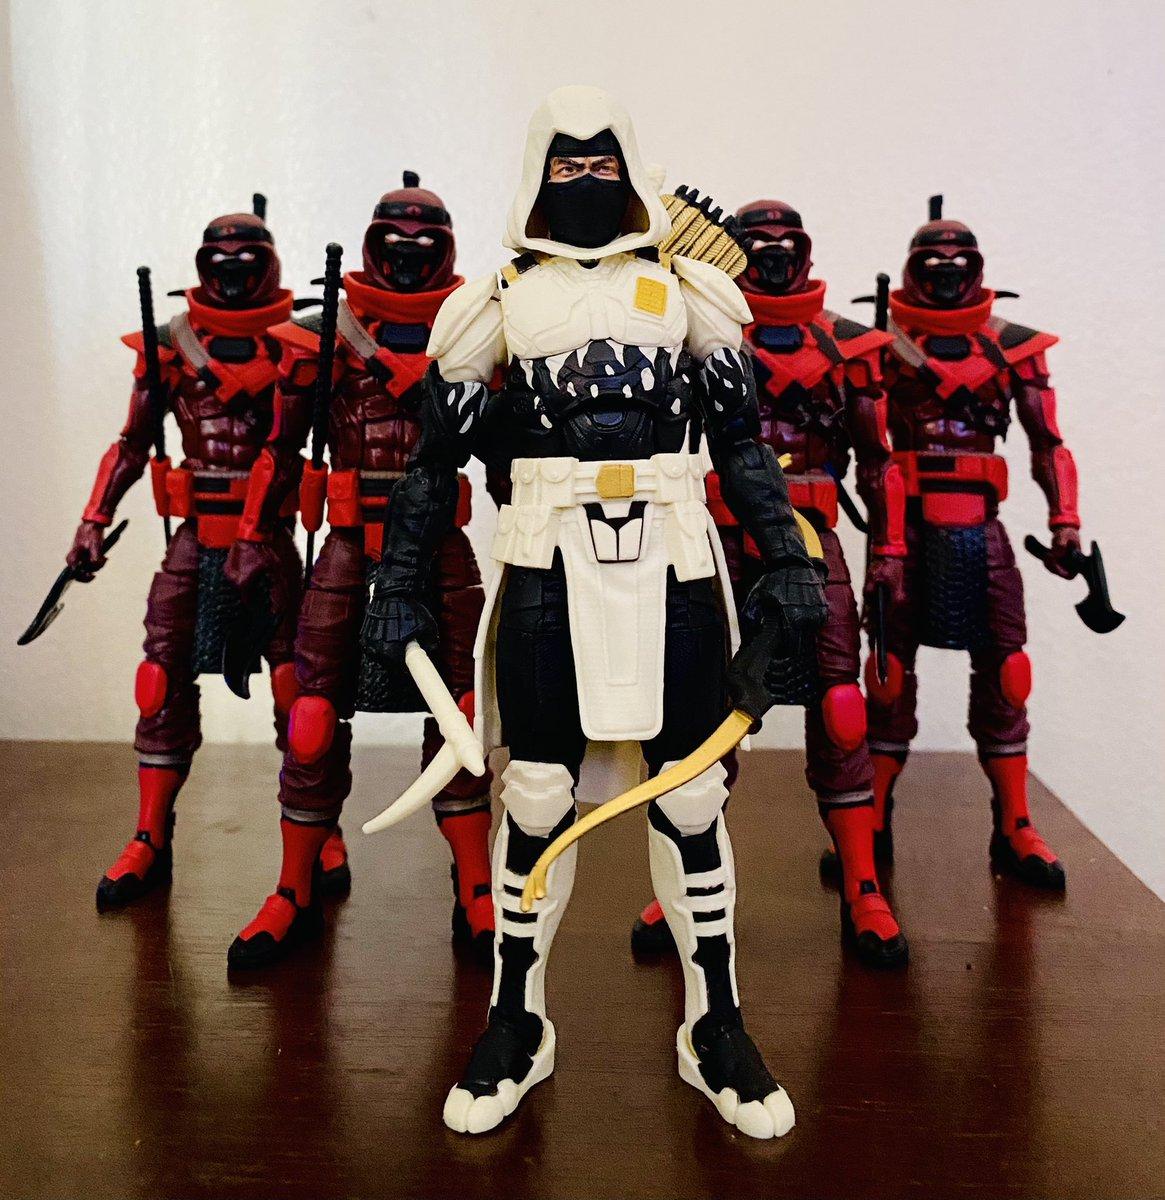 Cobra ninjas #Gijoe #Gijoeclassified #Cobra #Stormshadow